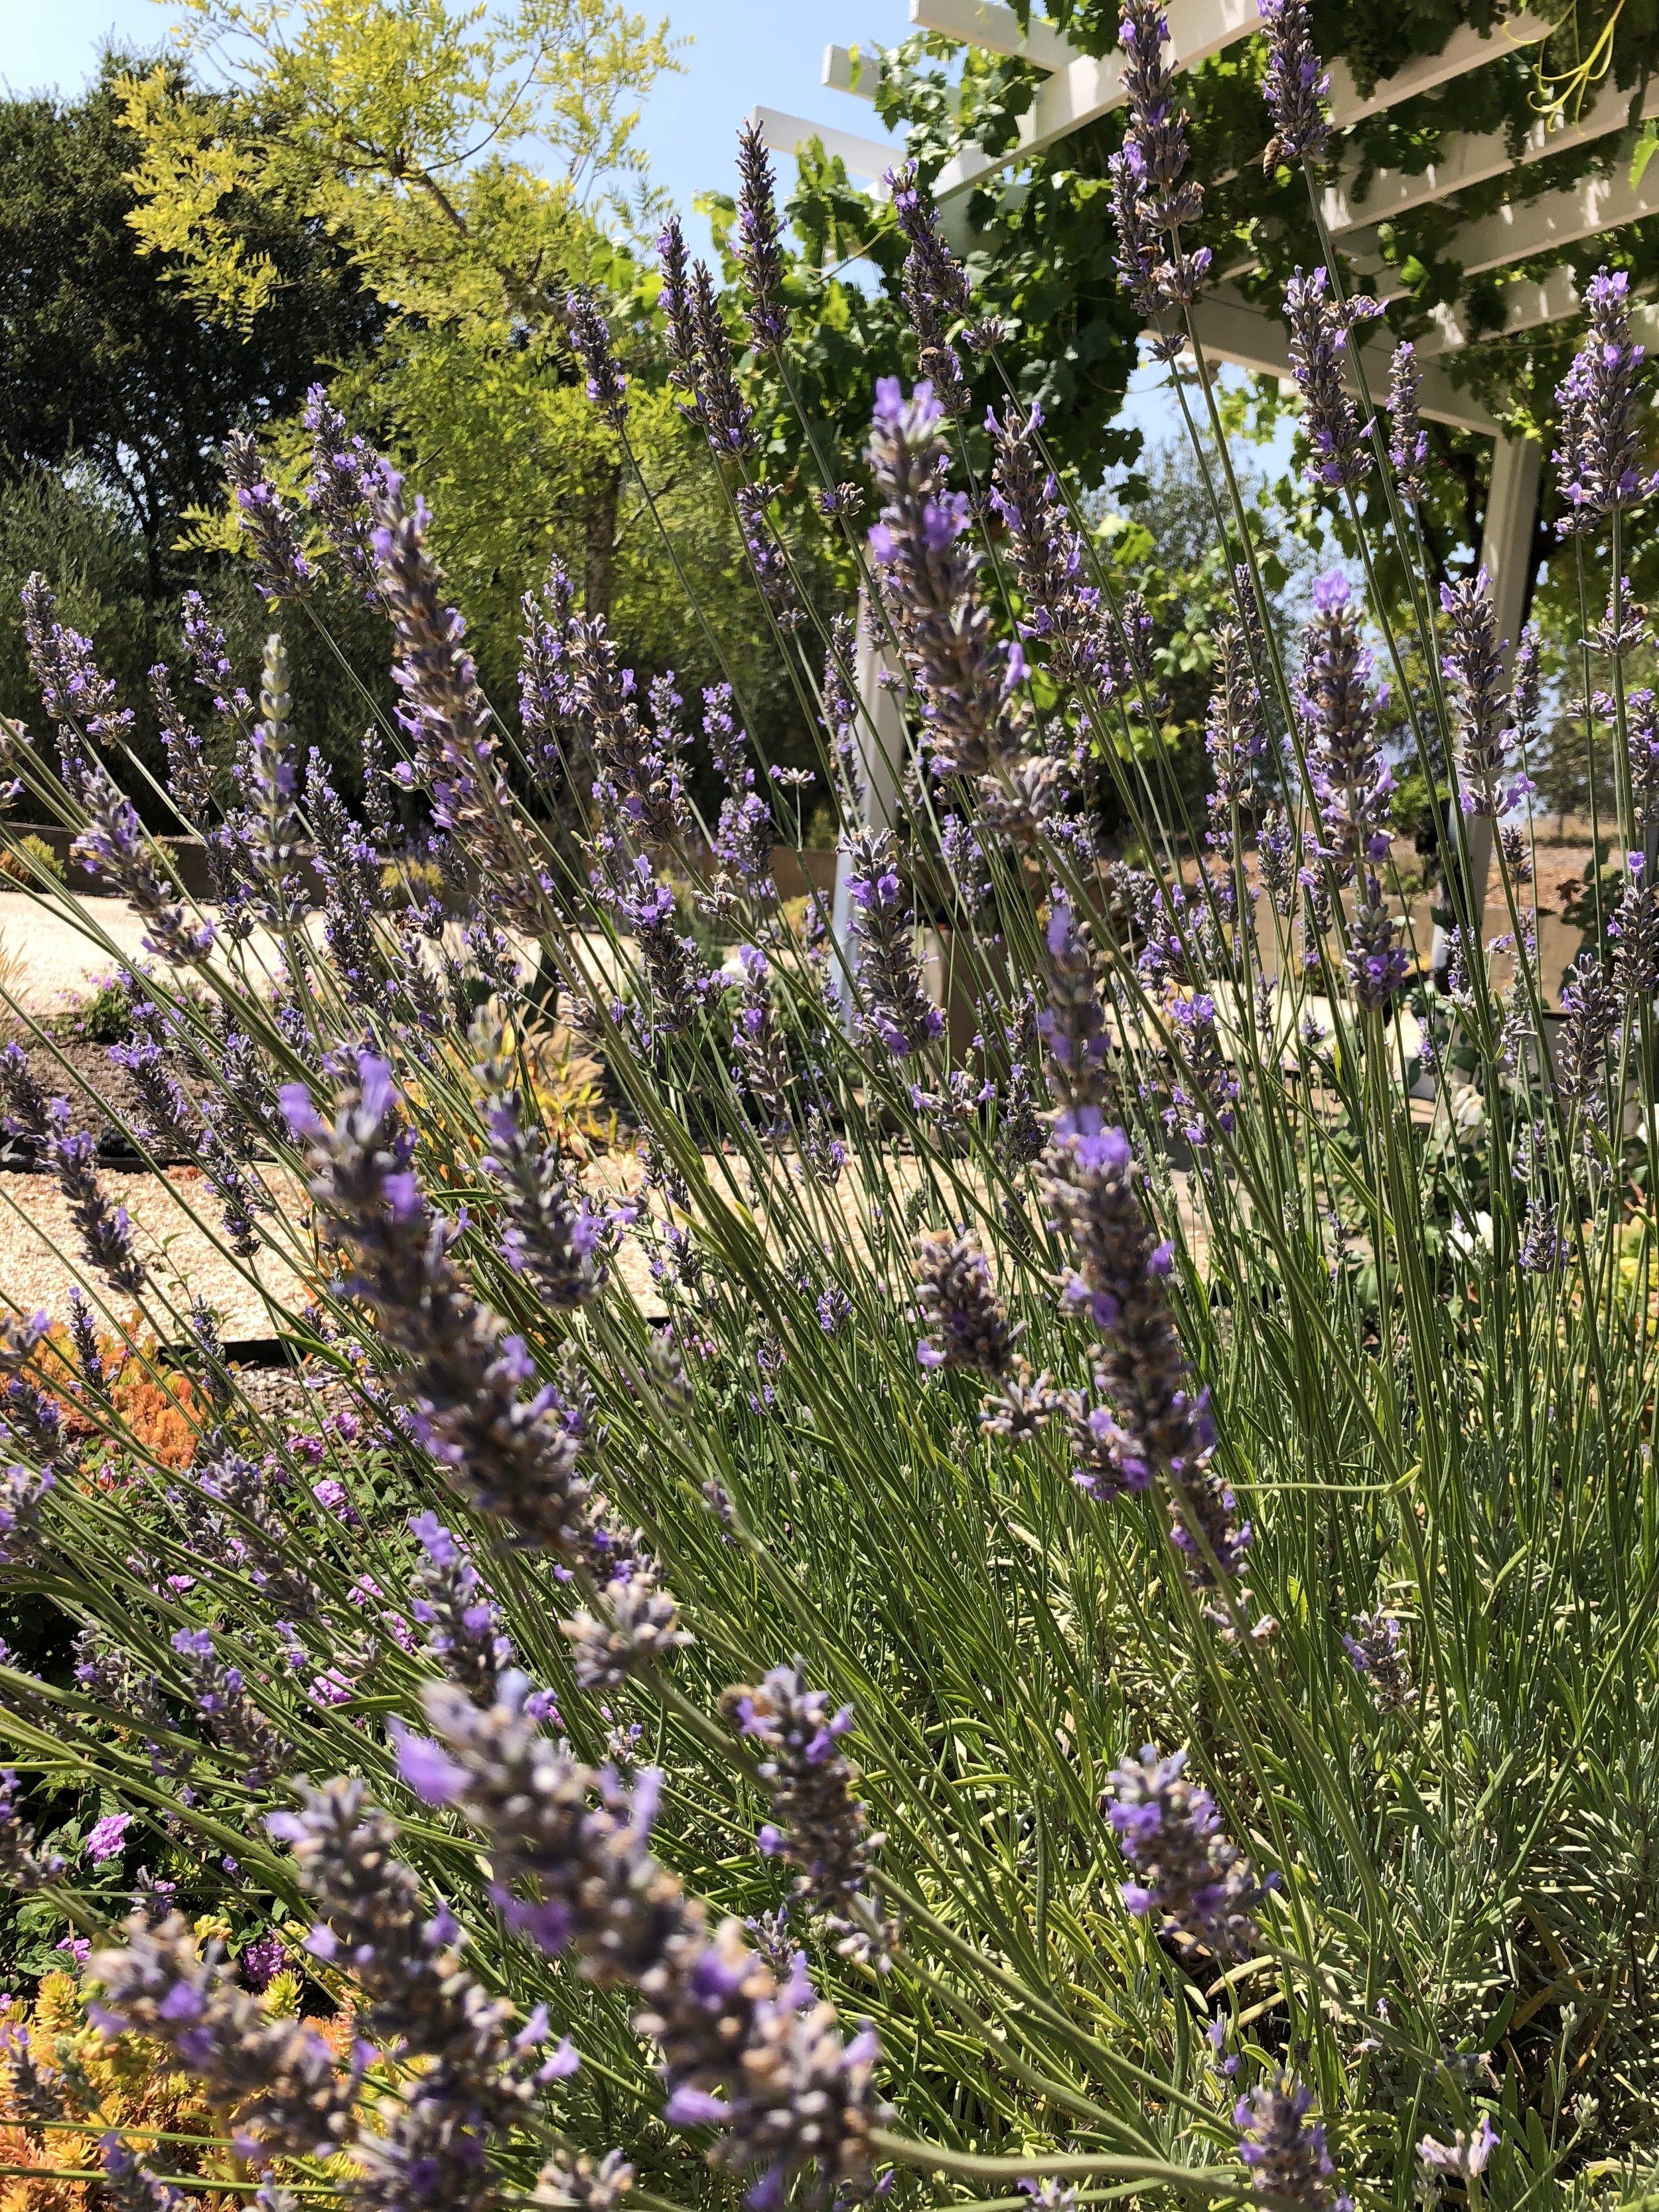 Lavender bush in Glen Ellen, CA. Photo: @gutofintegrity